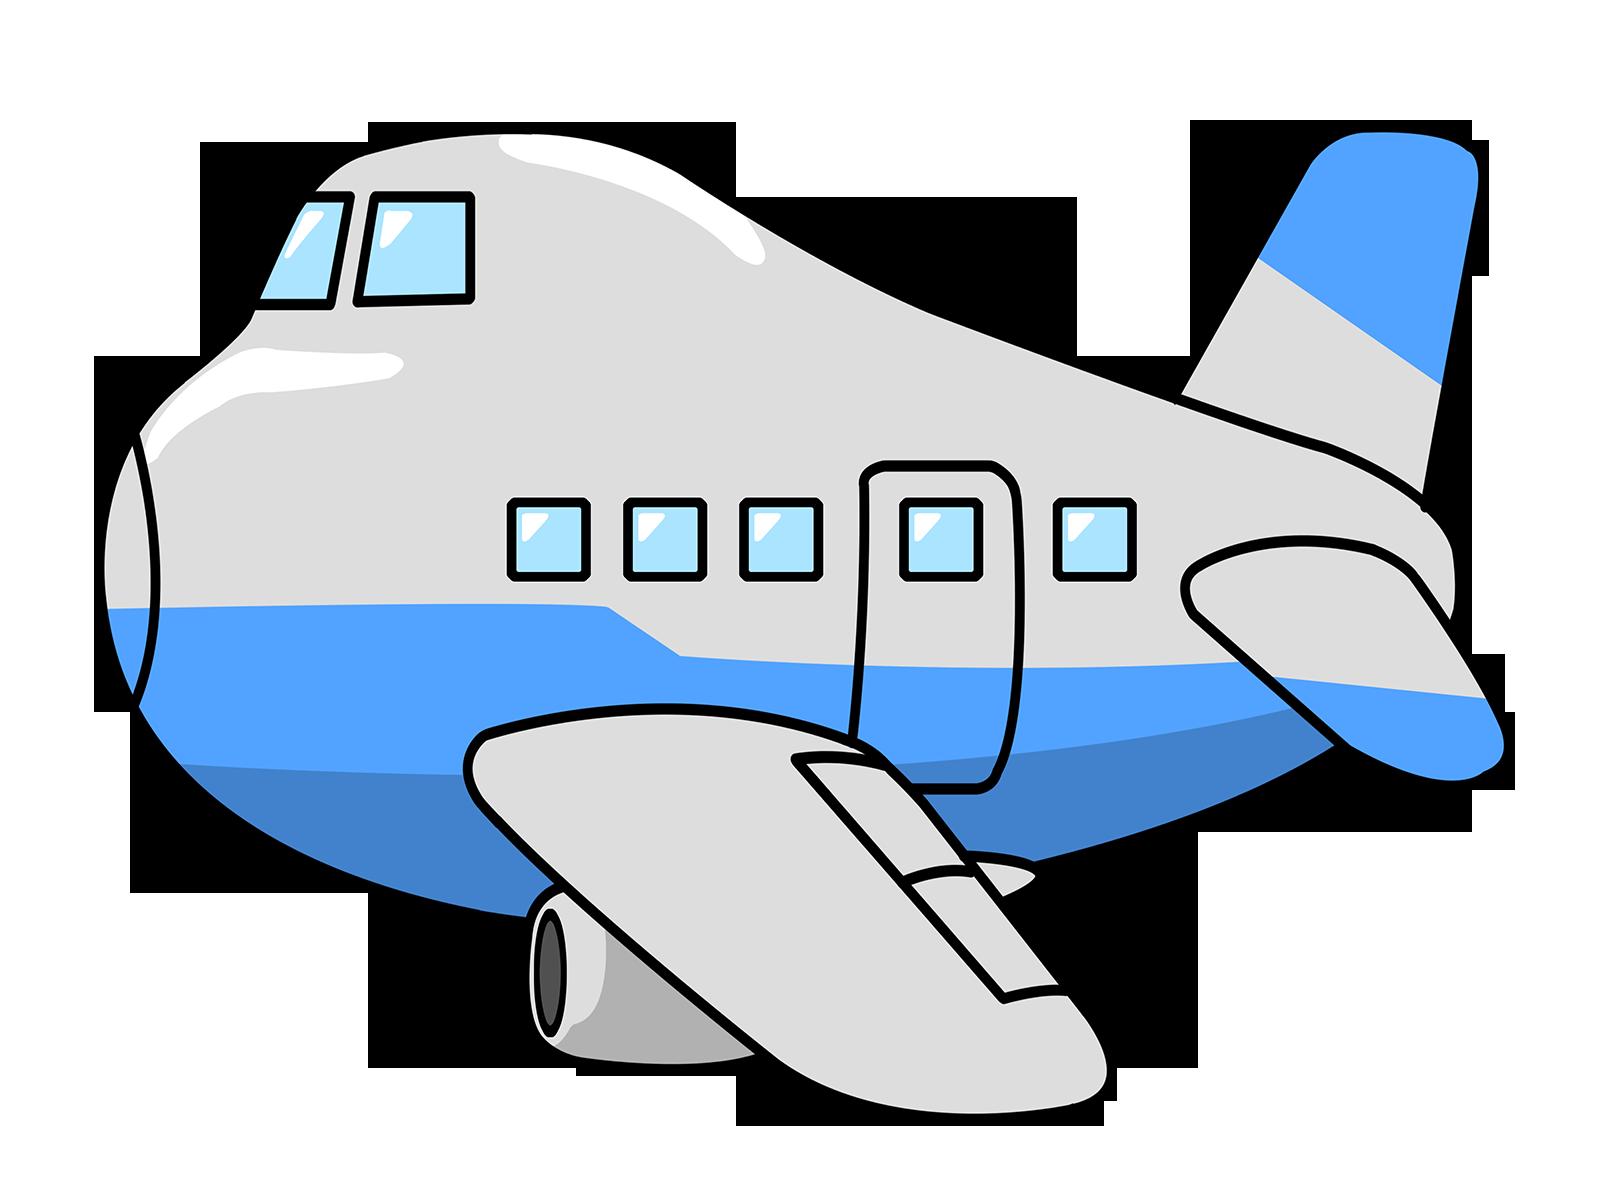 Sad airplane